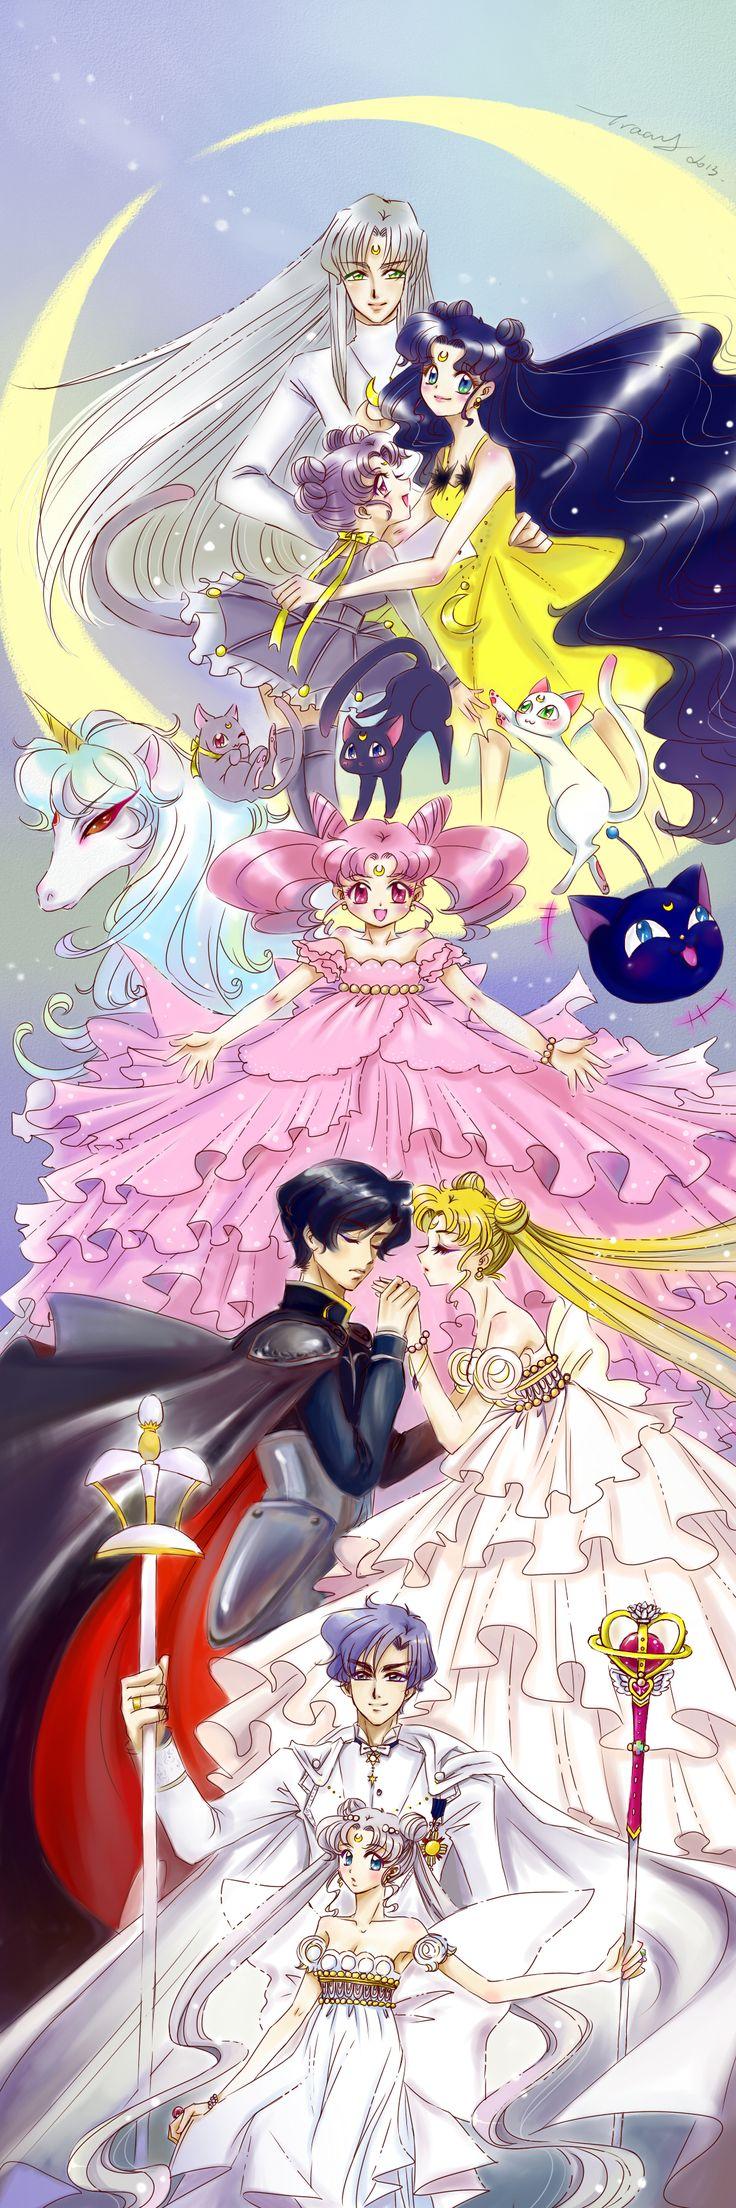 /Bishoujo Senshi Sailor Moon/#1481669 - Zerochan. Cool stuff is cool. Plus, ya know, Artemis.